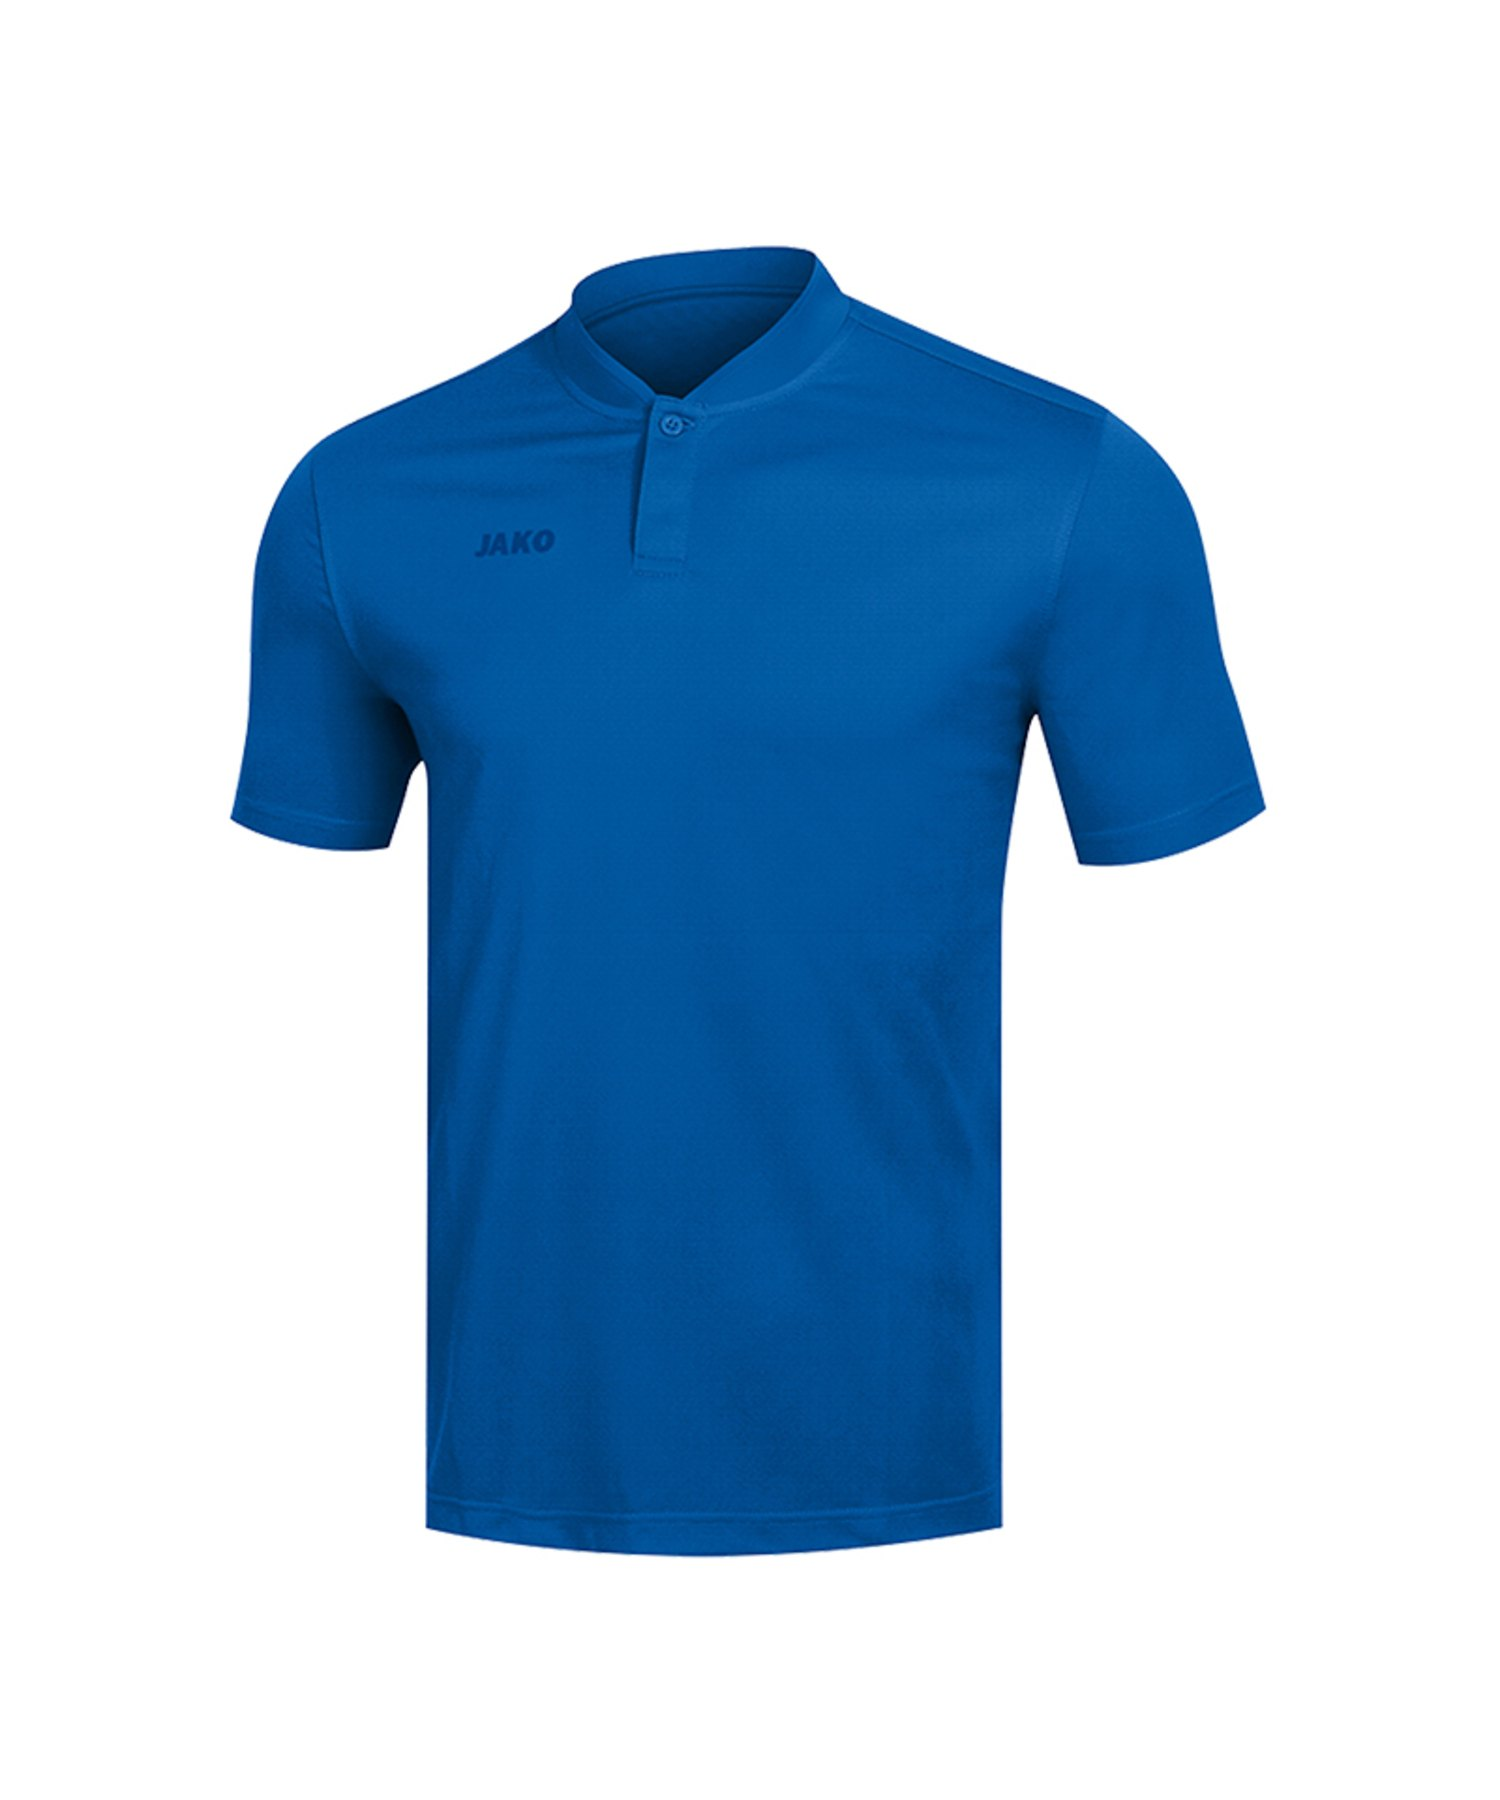 Jako Prestige Poloshirt Blau F04 - Blau